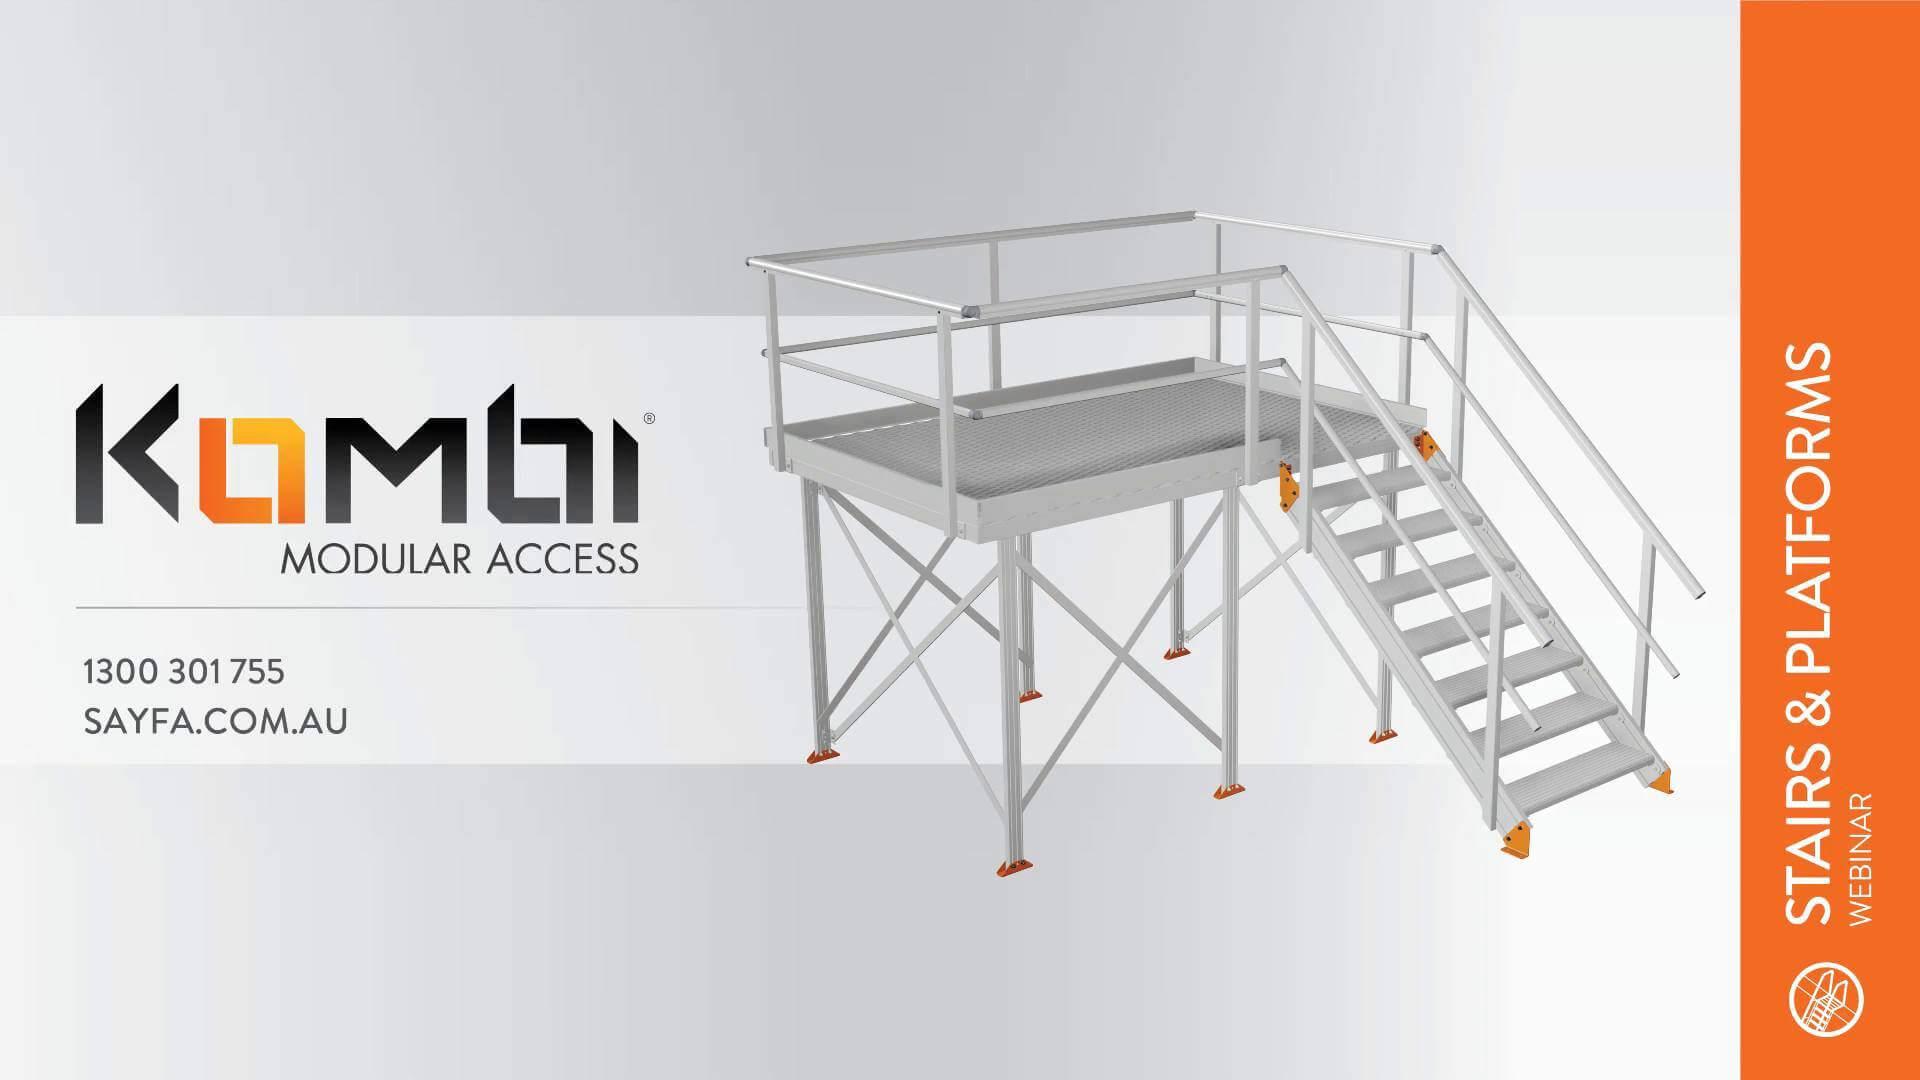 Kombi Stair & Platform Webinar 1 - Introduction to Kombi - click to view